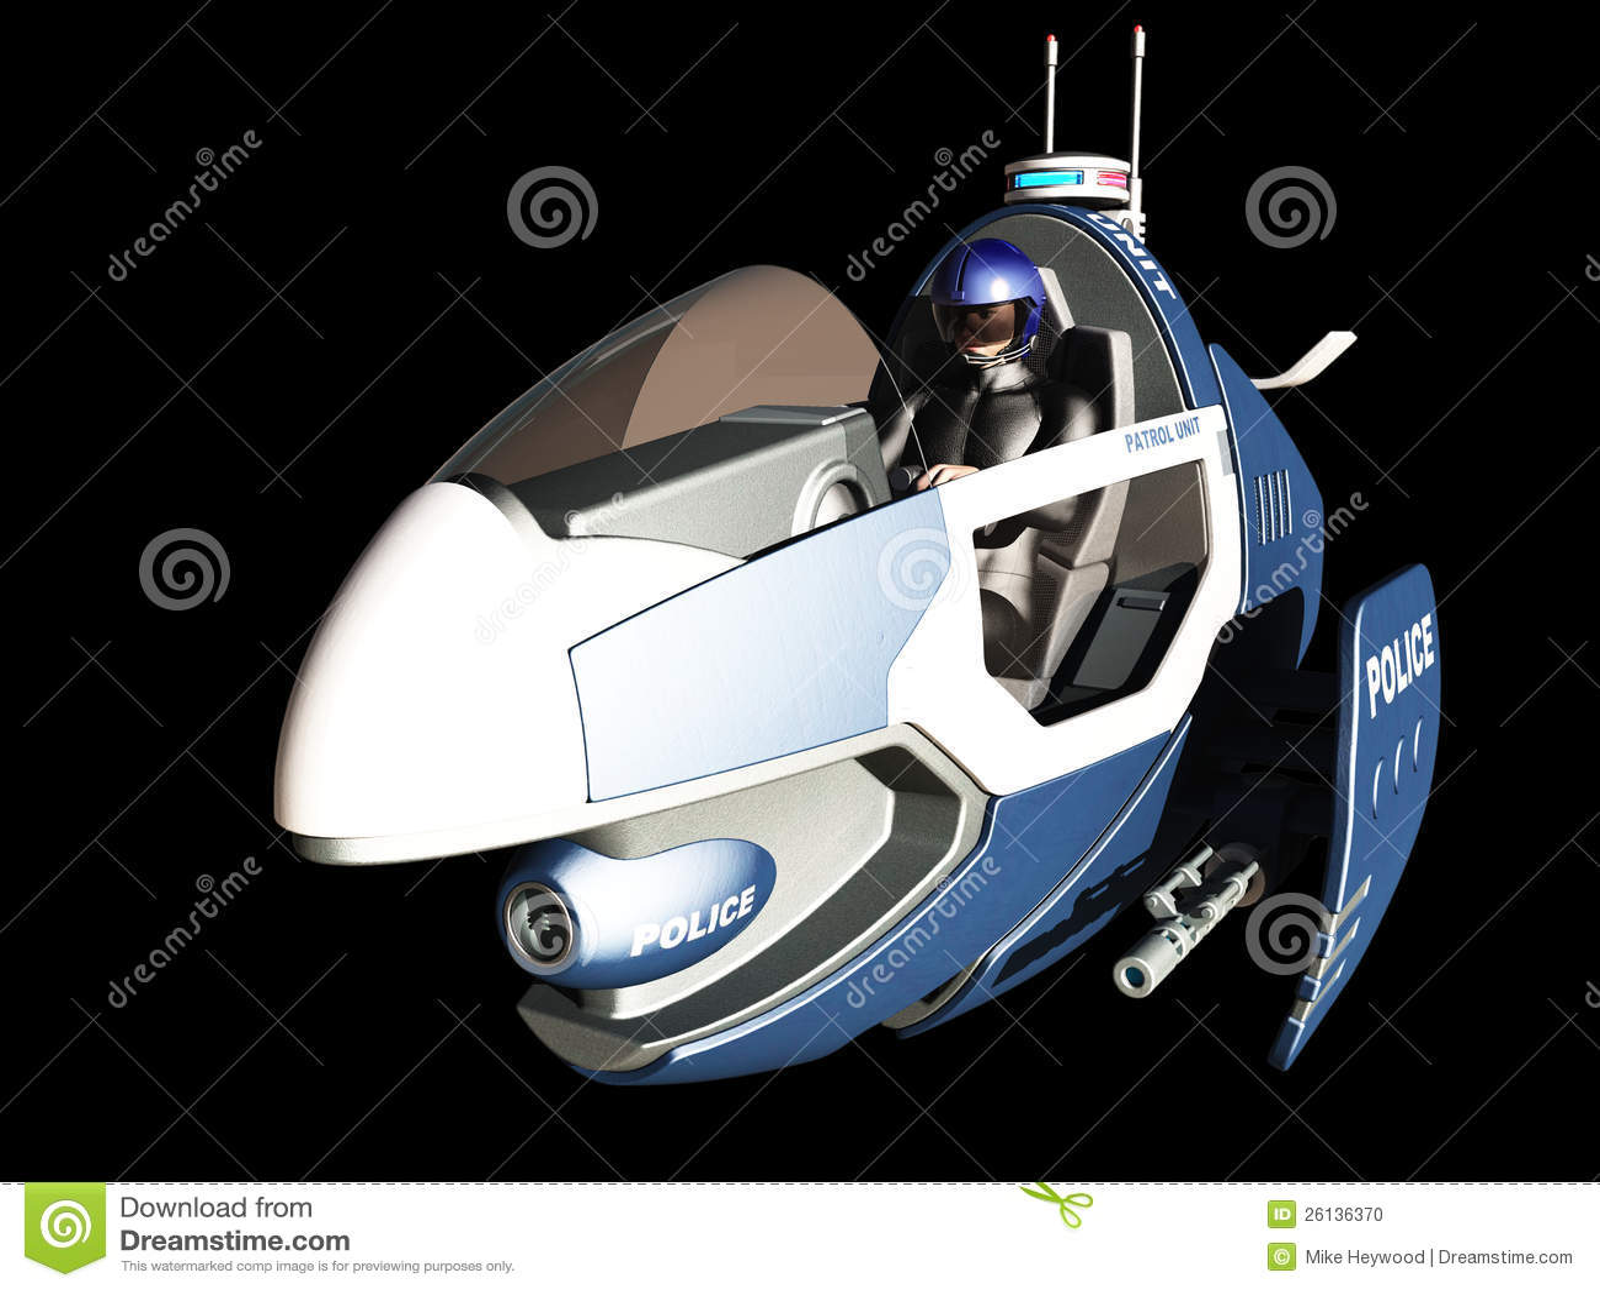 futuristic police patrol vehicle stock photo image 26136370